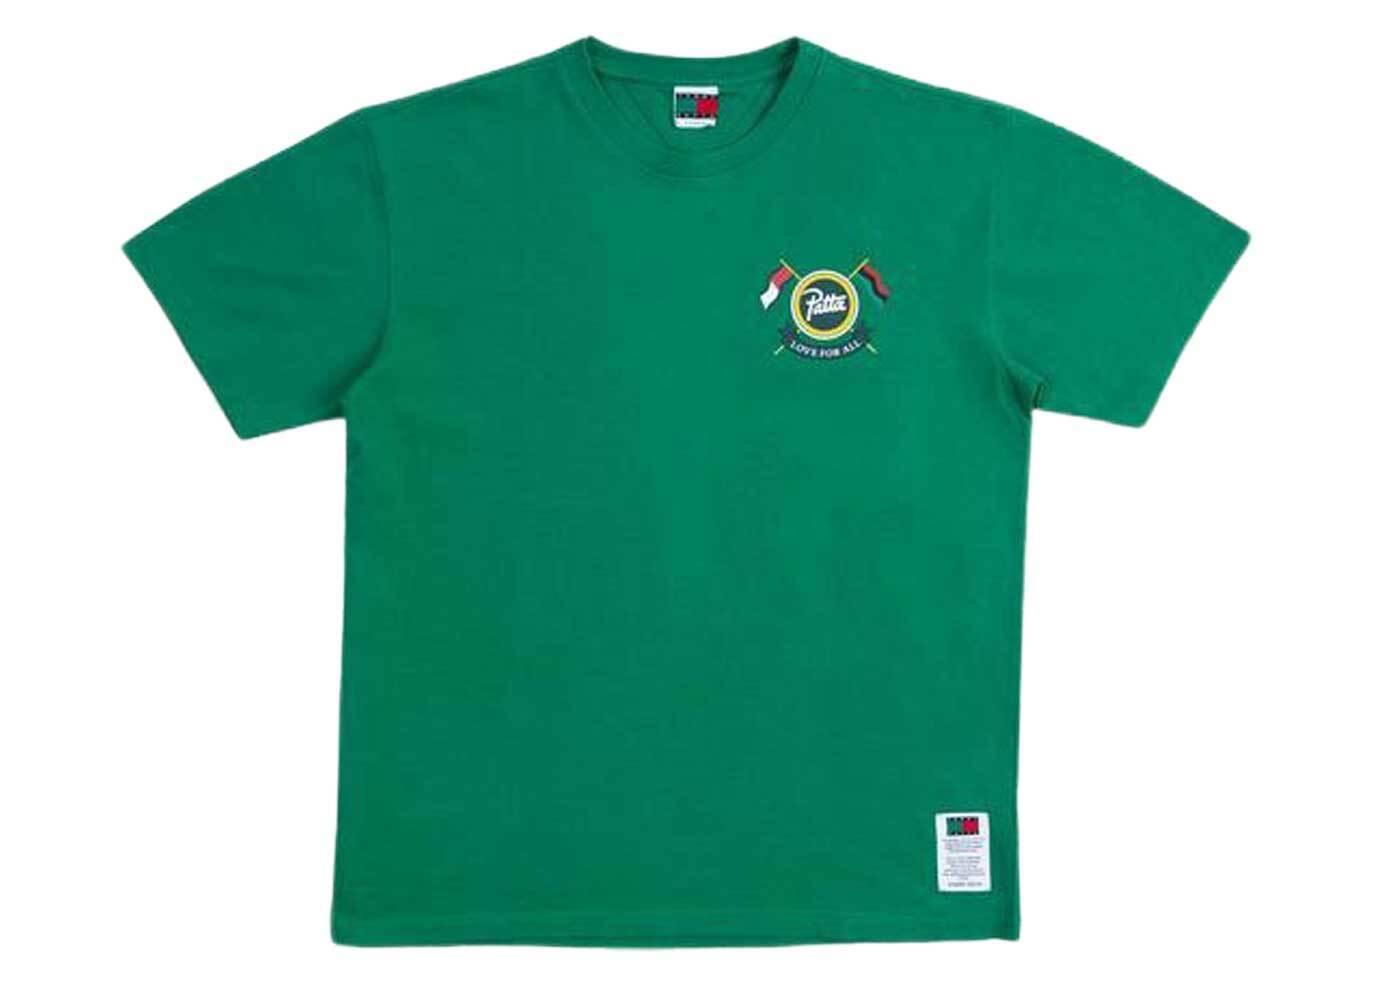 Patta × Tommy Community T Shirt Jelly Bean (SS21)の写真